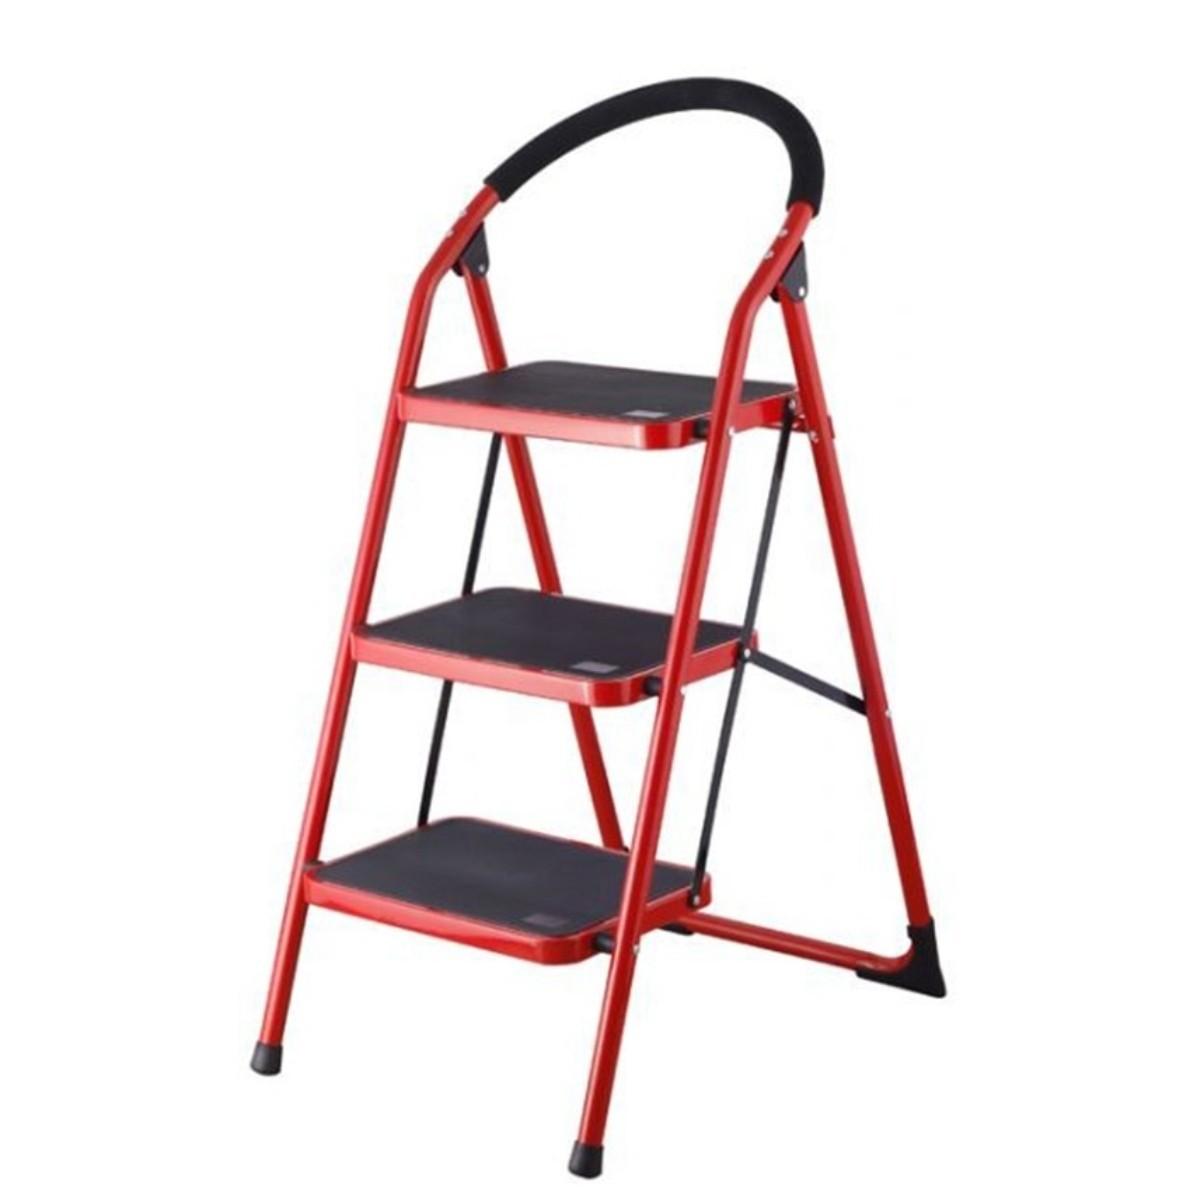 escalera de 3 niveles silla port til multiuso y plegable 150kg